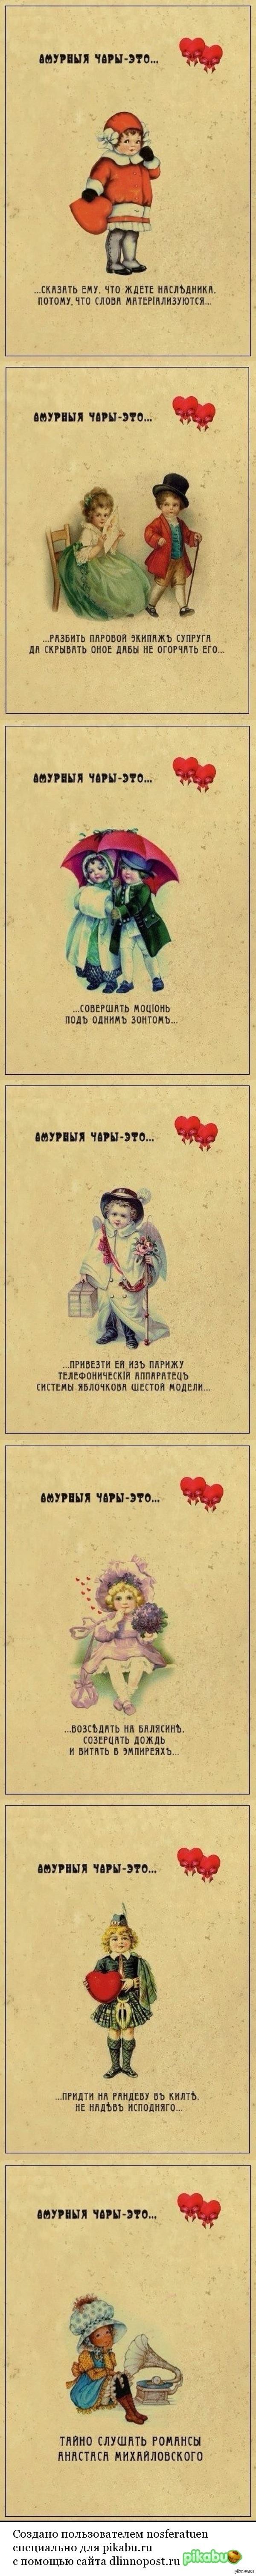 http://s6.pikabu.ru/post_img/2014/06/19/9/1403188207_384376715.jpg